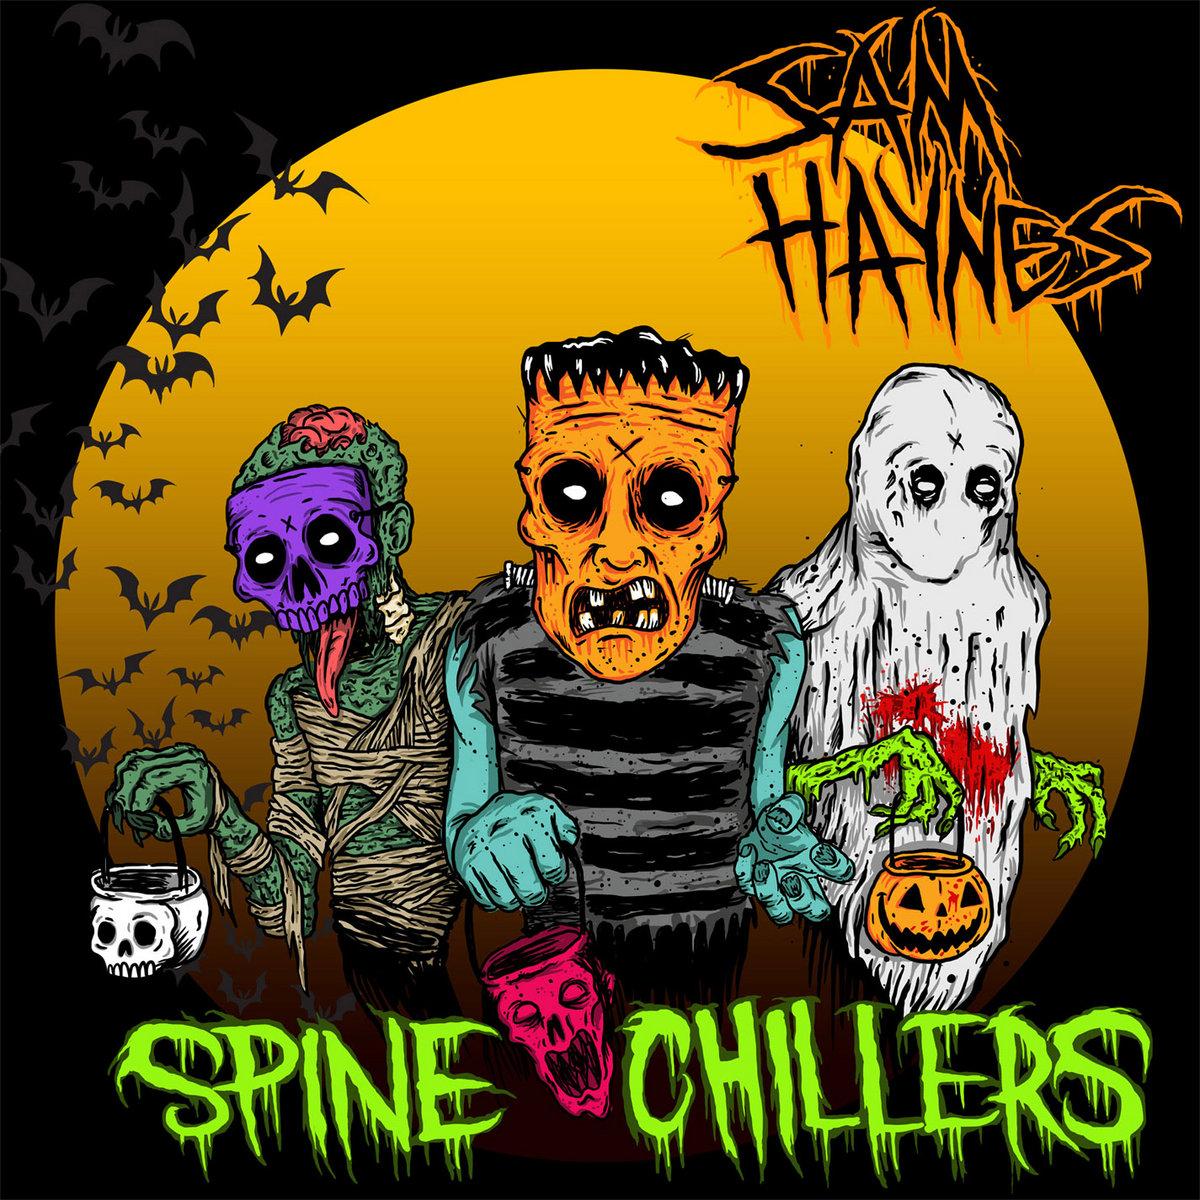 spine chillers - halloween haunt music | sam haynes - horror